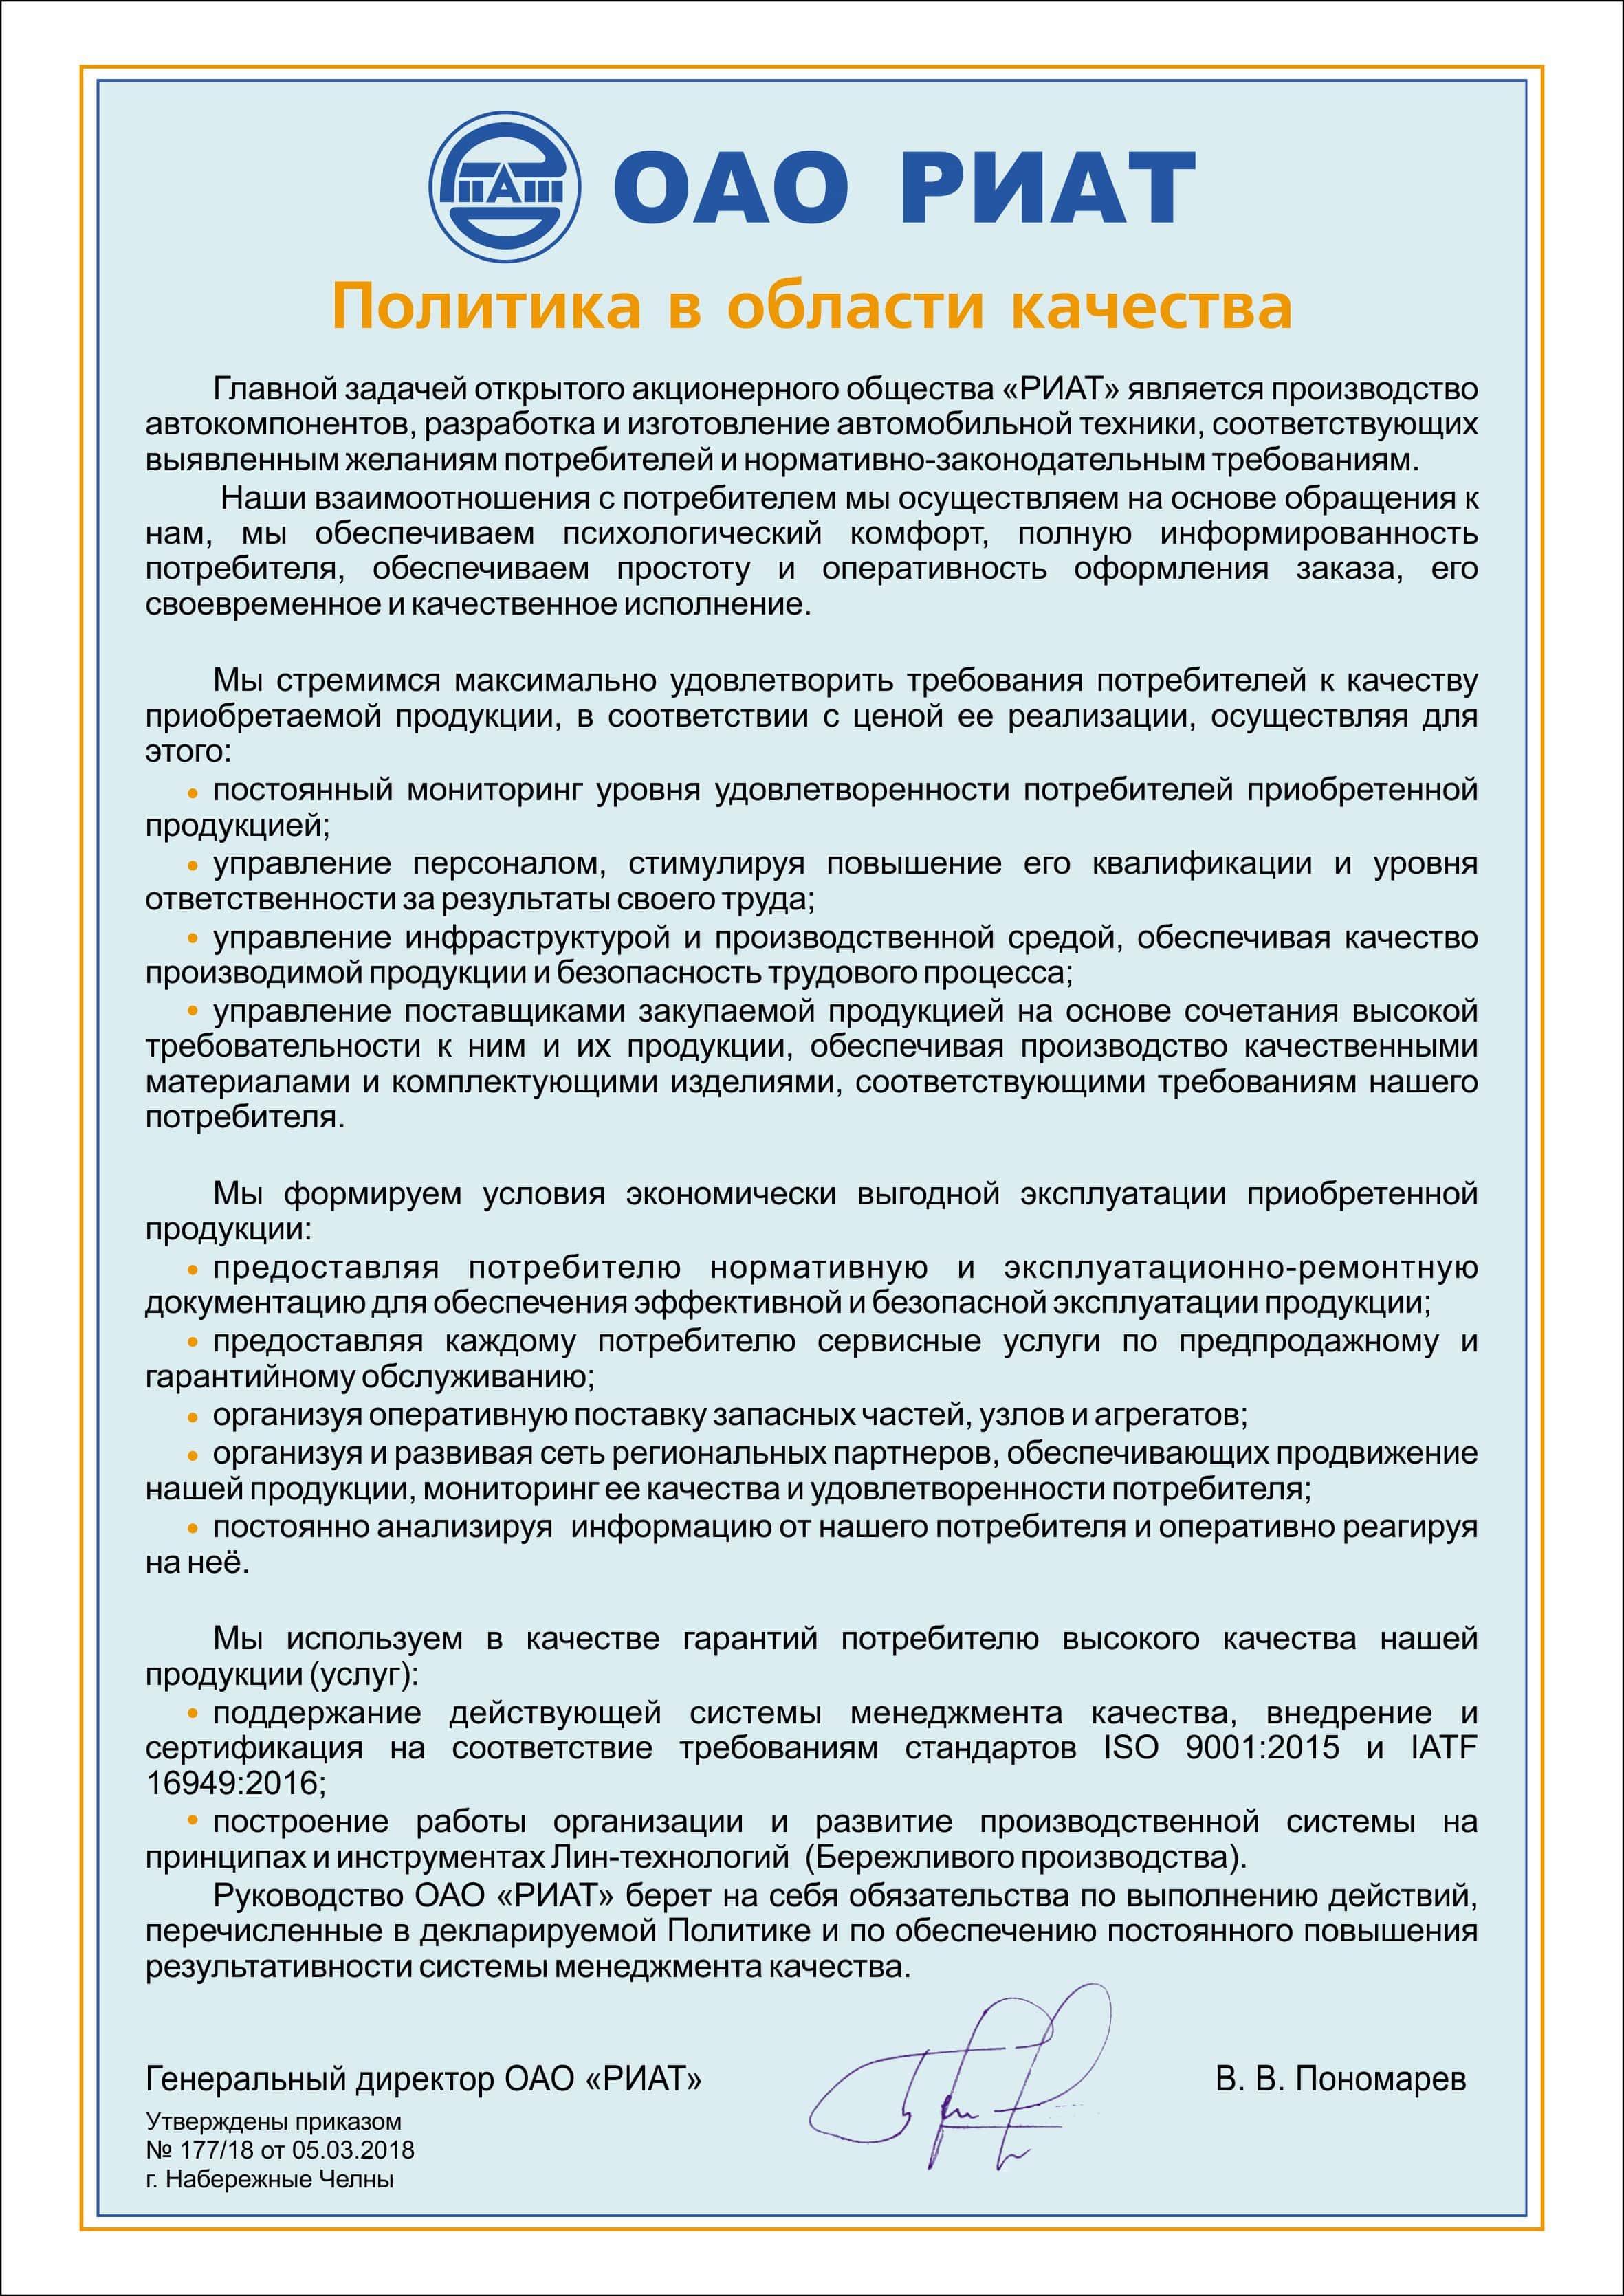 Политика в области качества компании ОАО